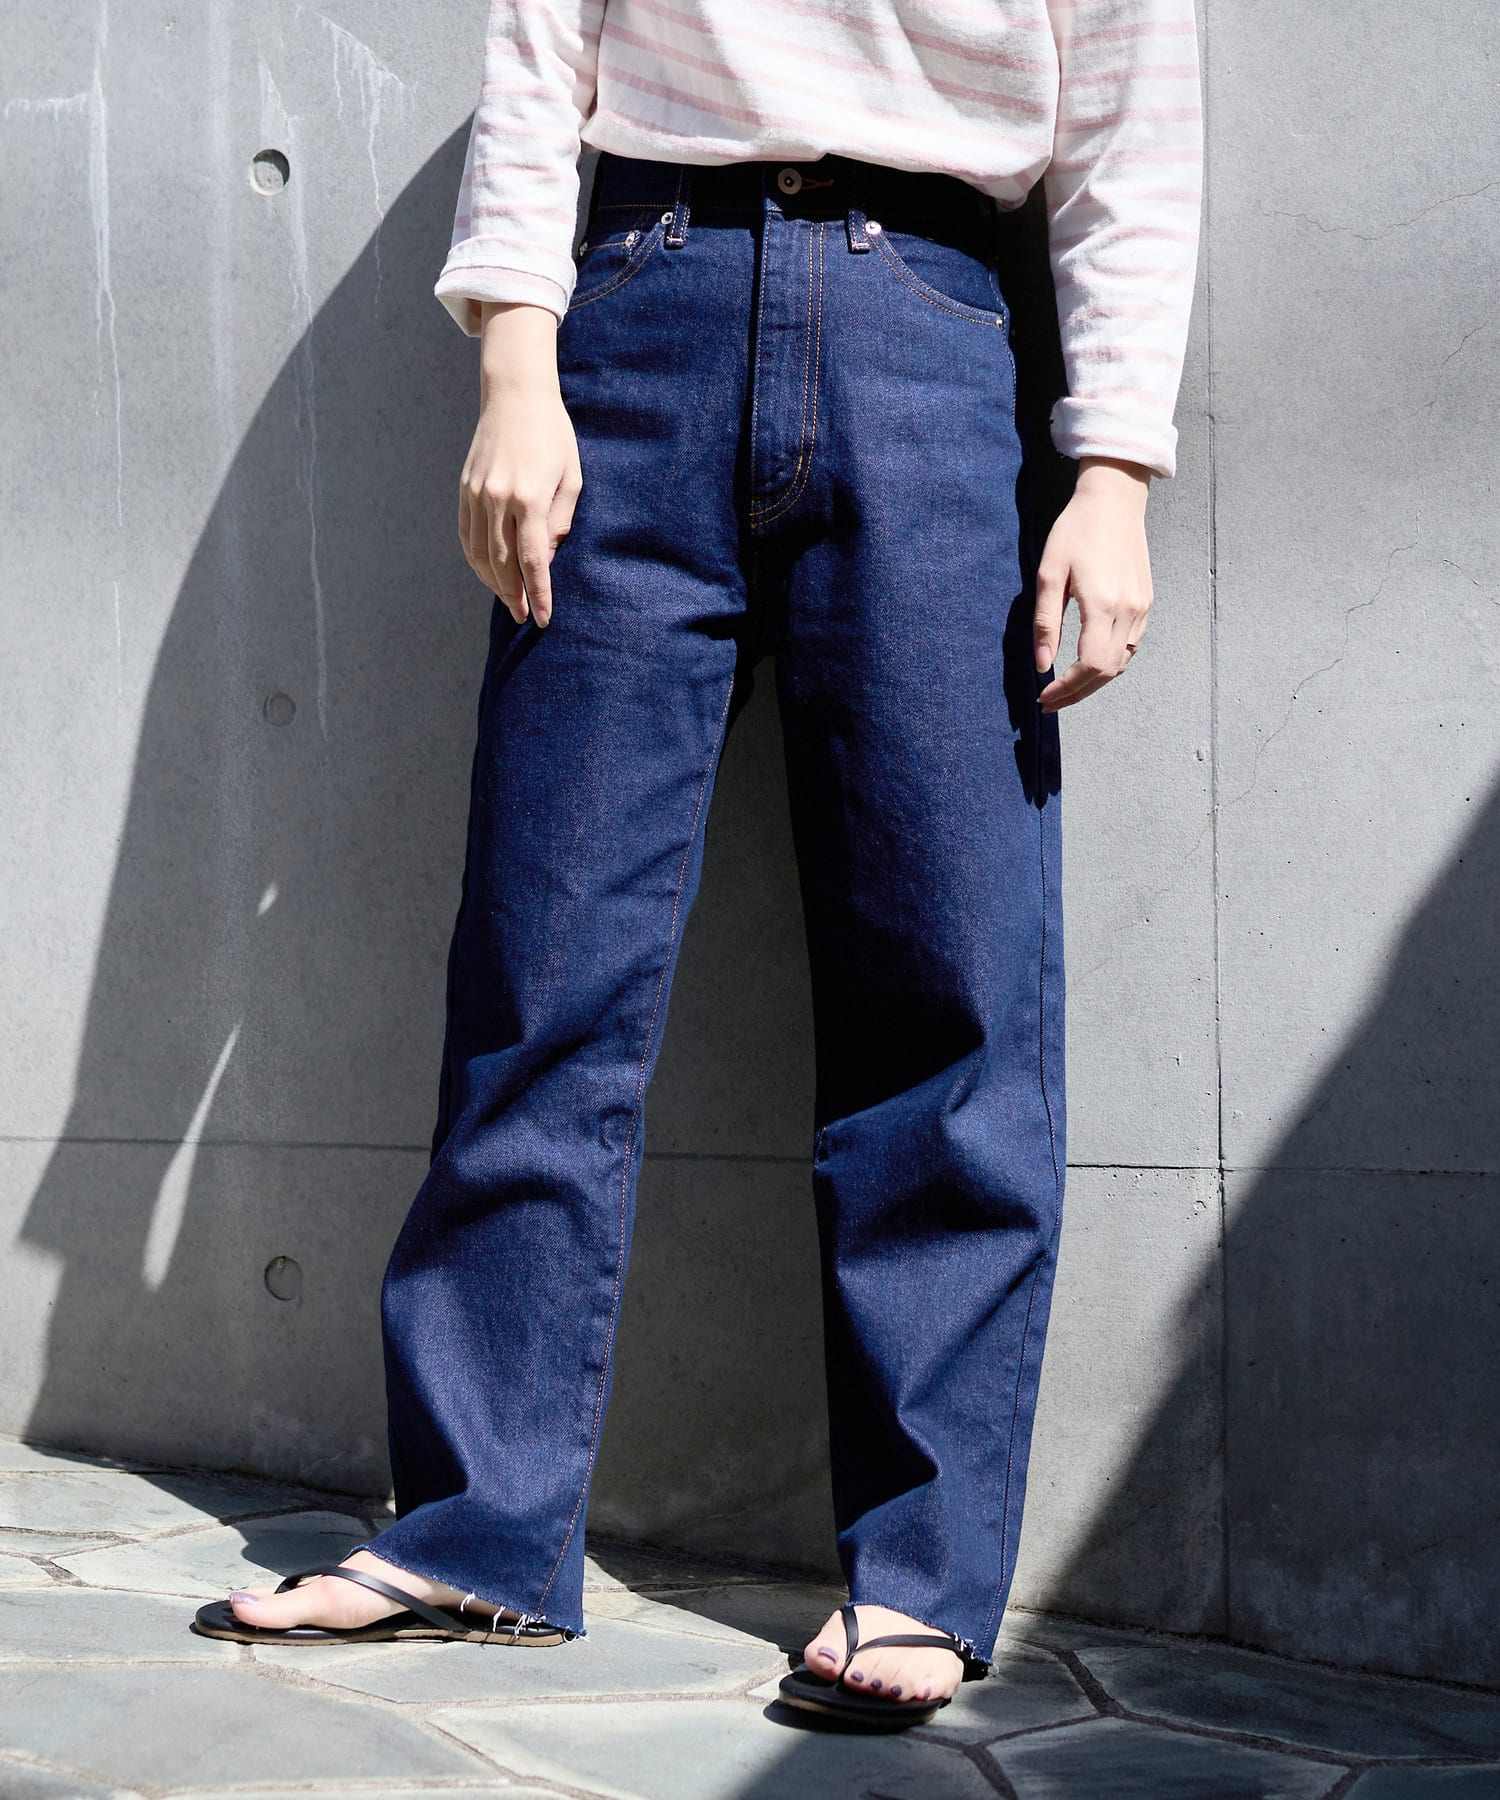 natural couture(ナチュラルクチュール) 【大人ナチュ】ピンクステッチハイウエストデニム